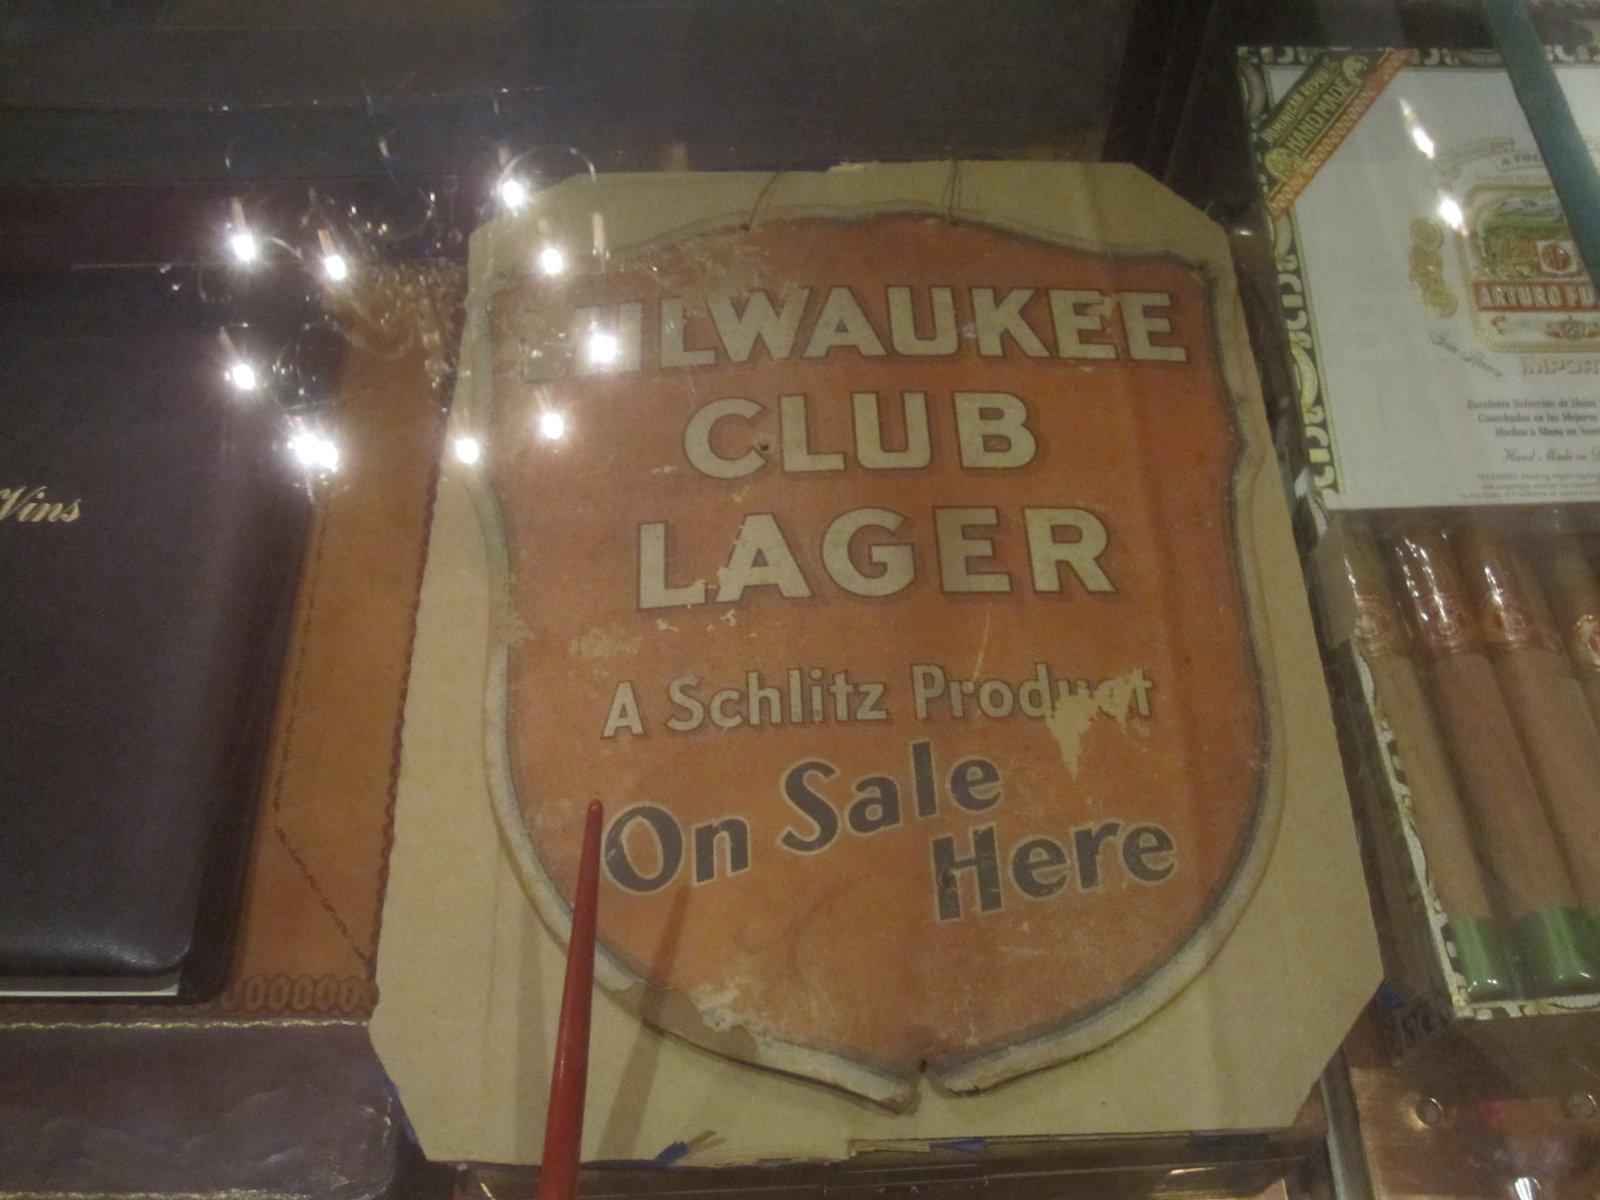 Milwaukee Club Lager